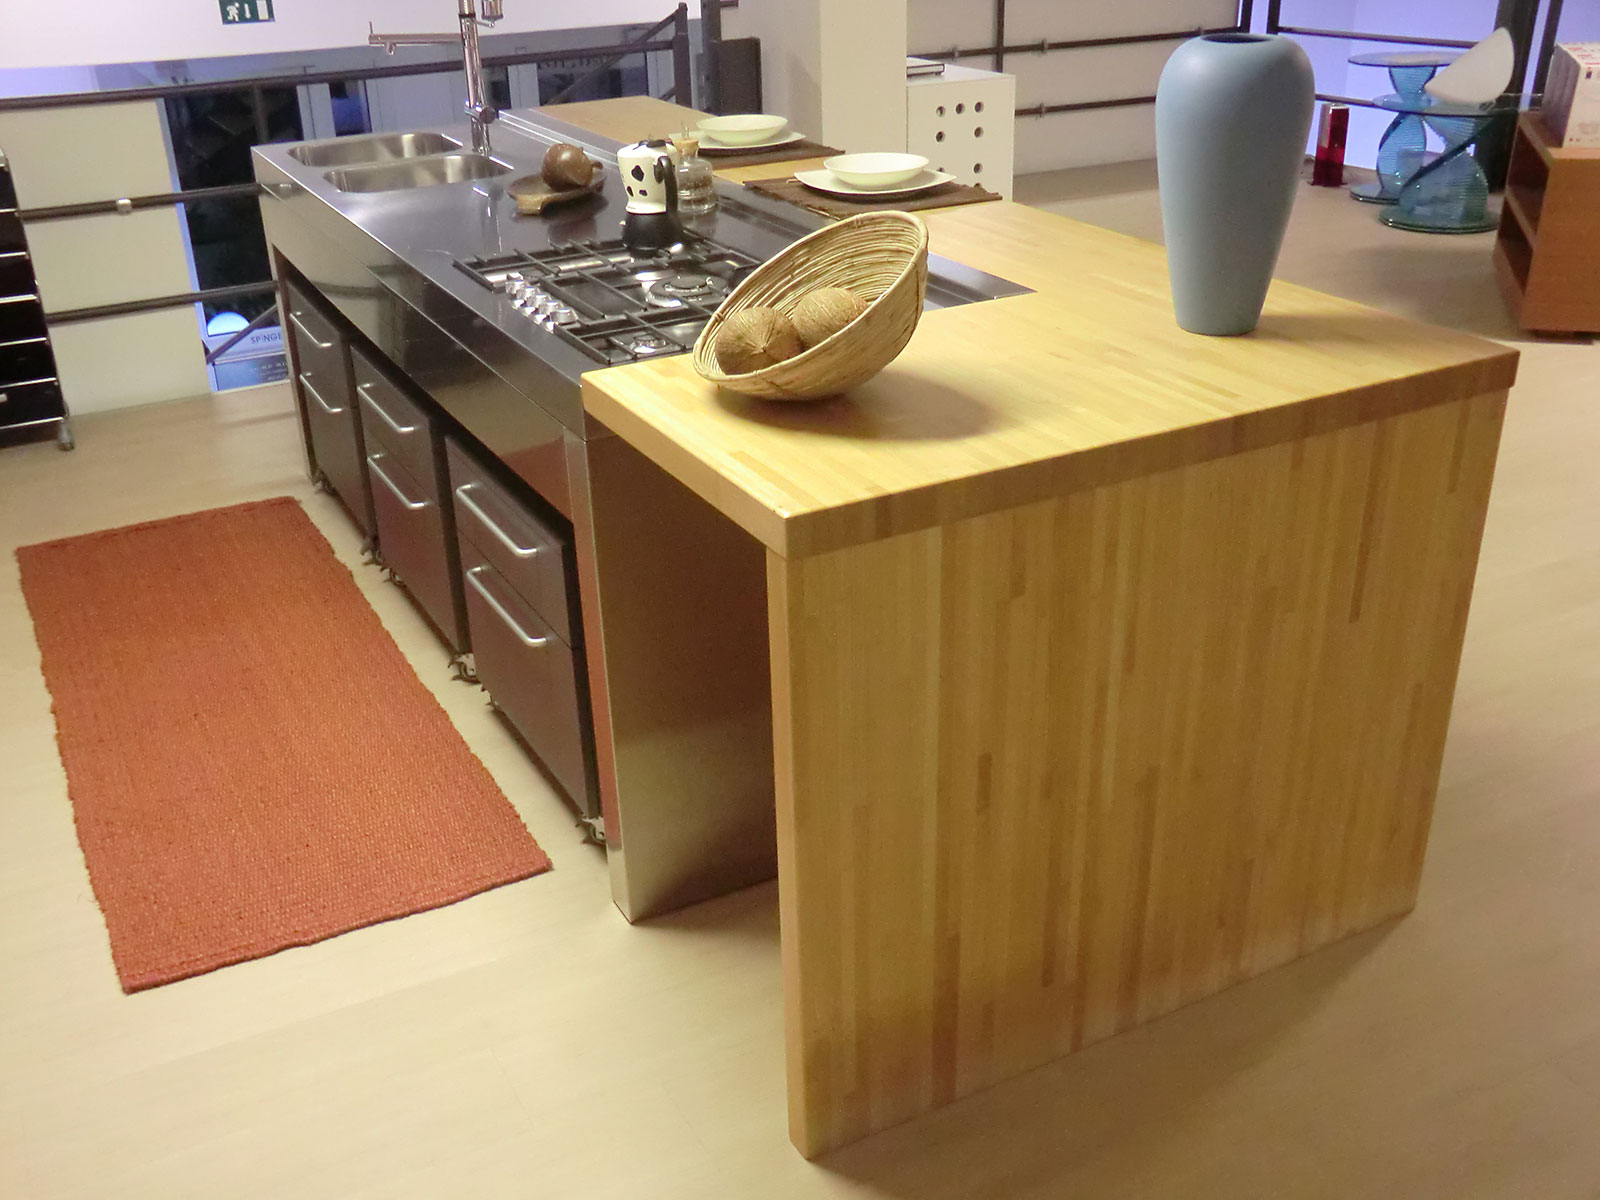 bancone cucina isola arredamenti outlet